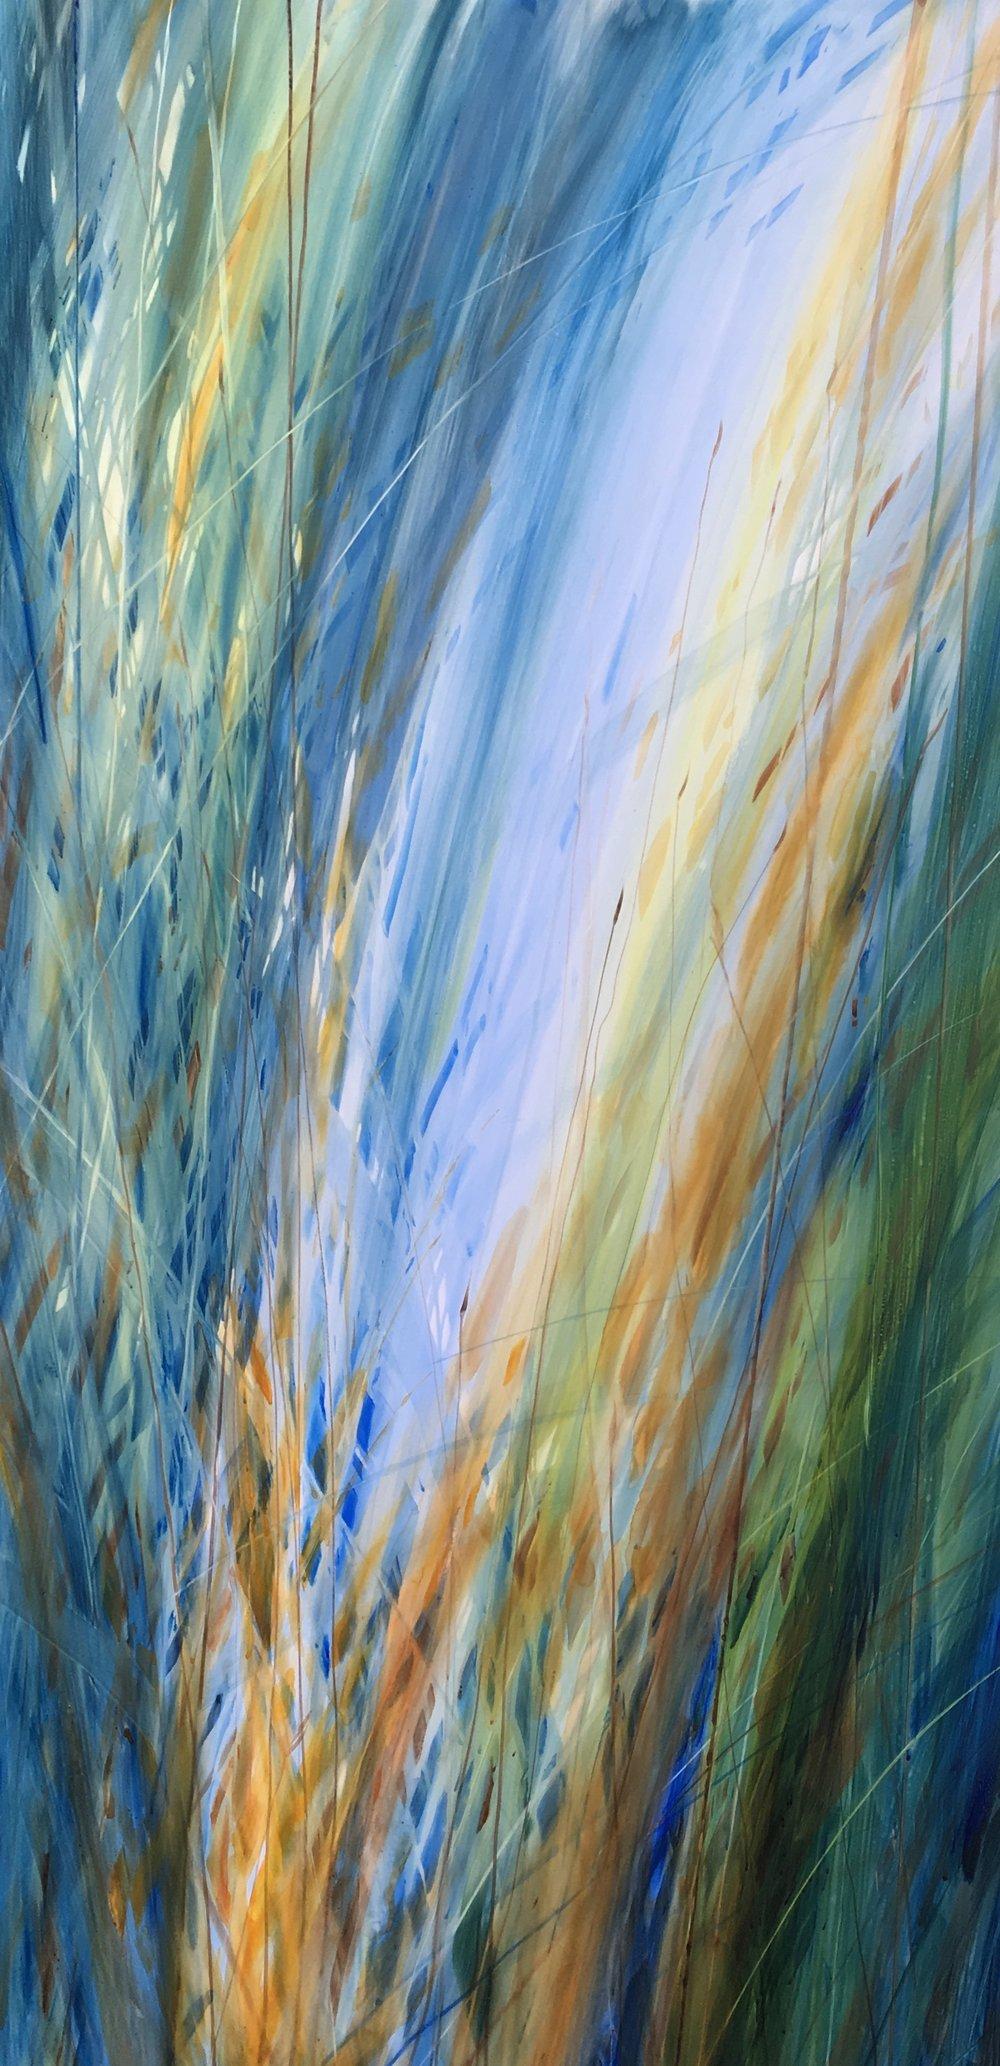 Hope and Healing_I - 96 x 48 on Aquaboard13,800.00